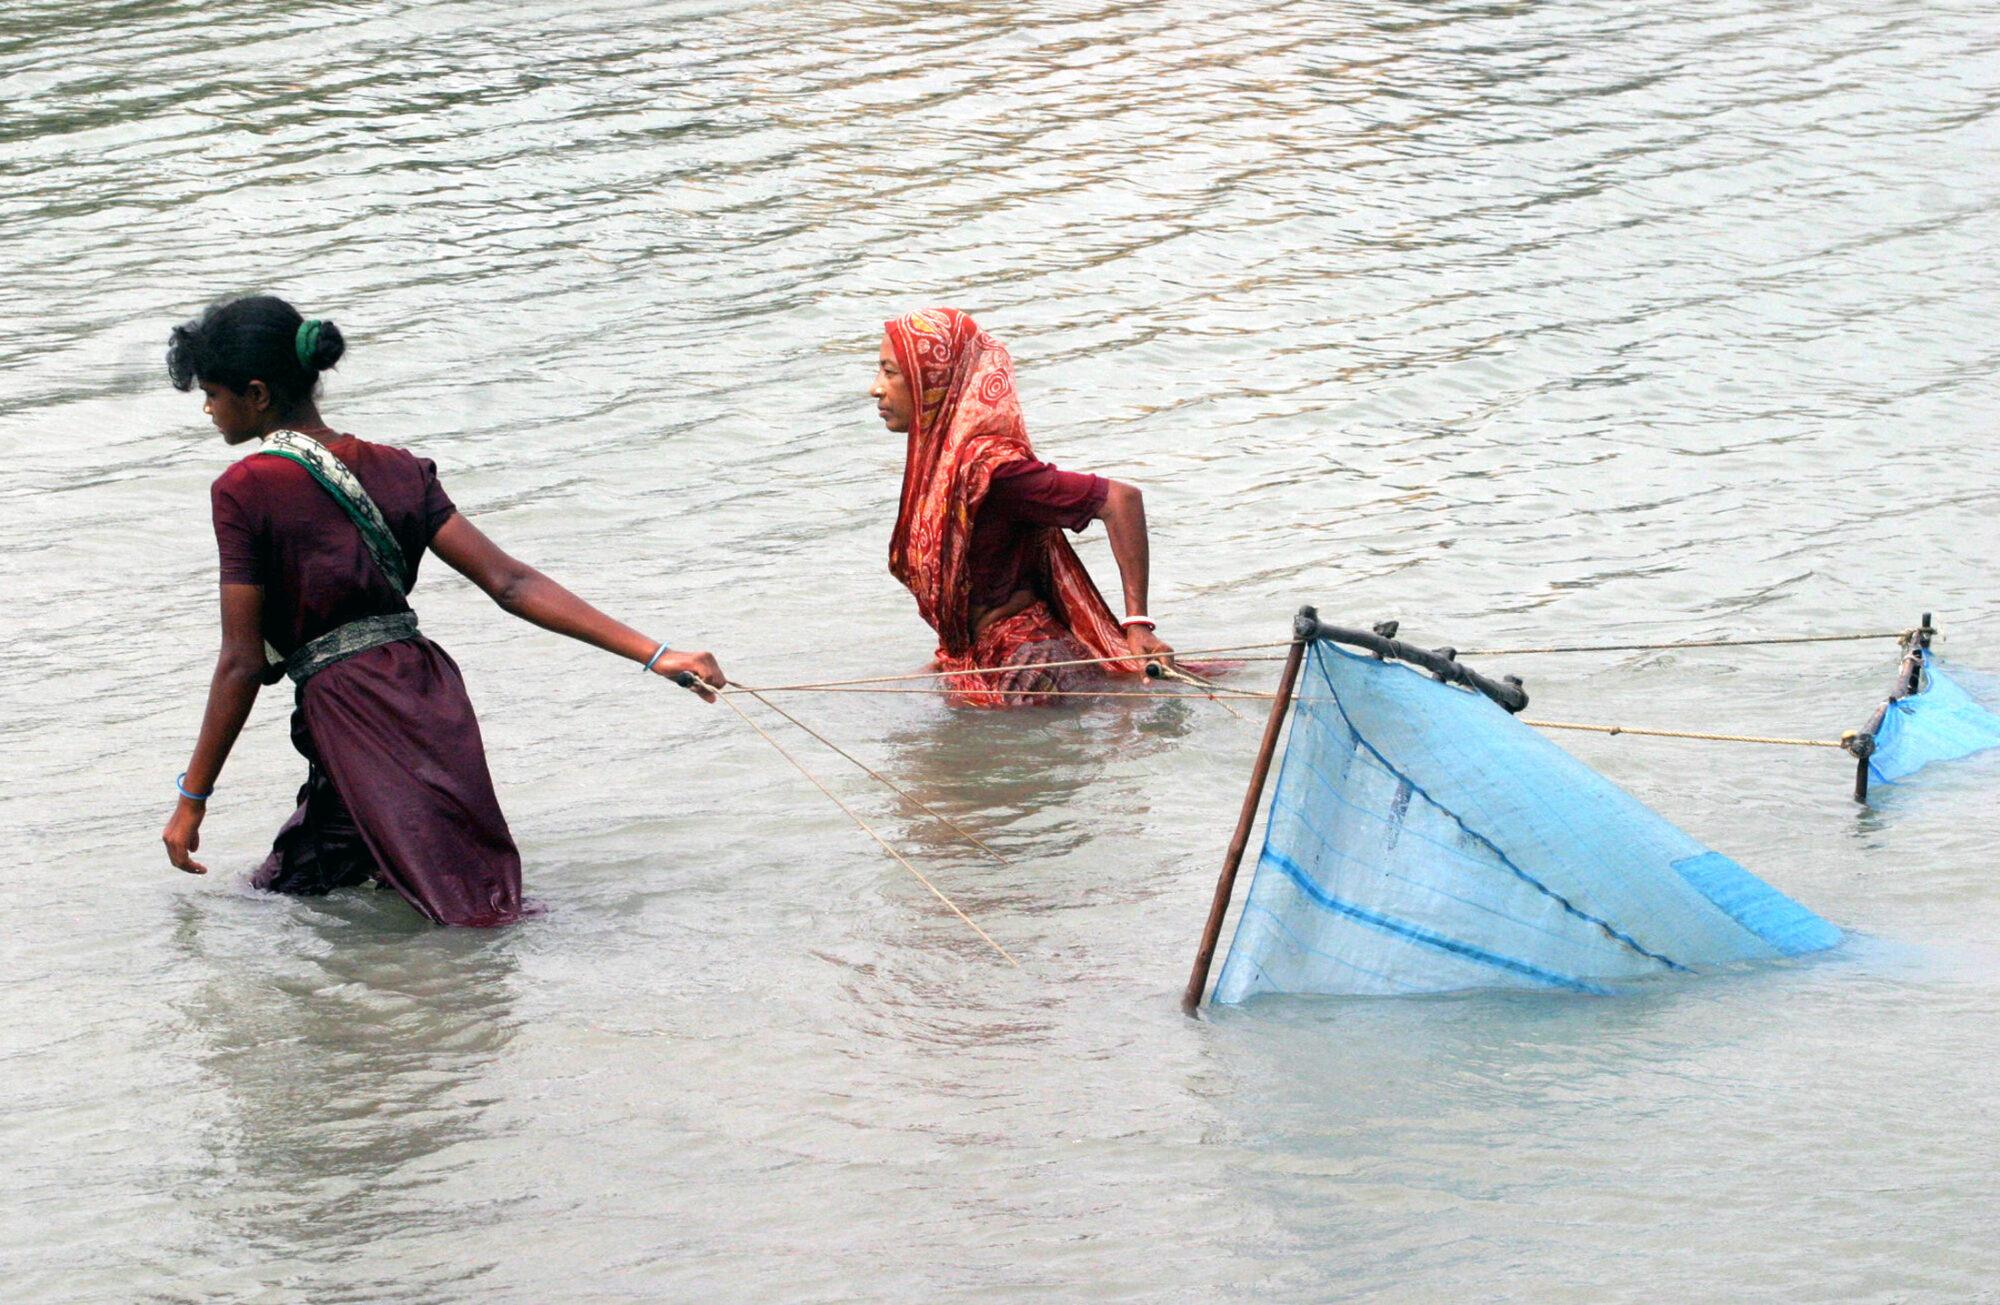 Bangladesh women catch shrimp with nets